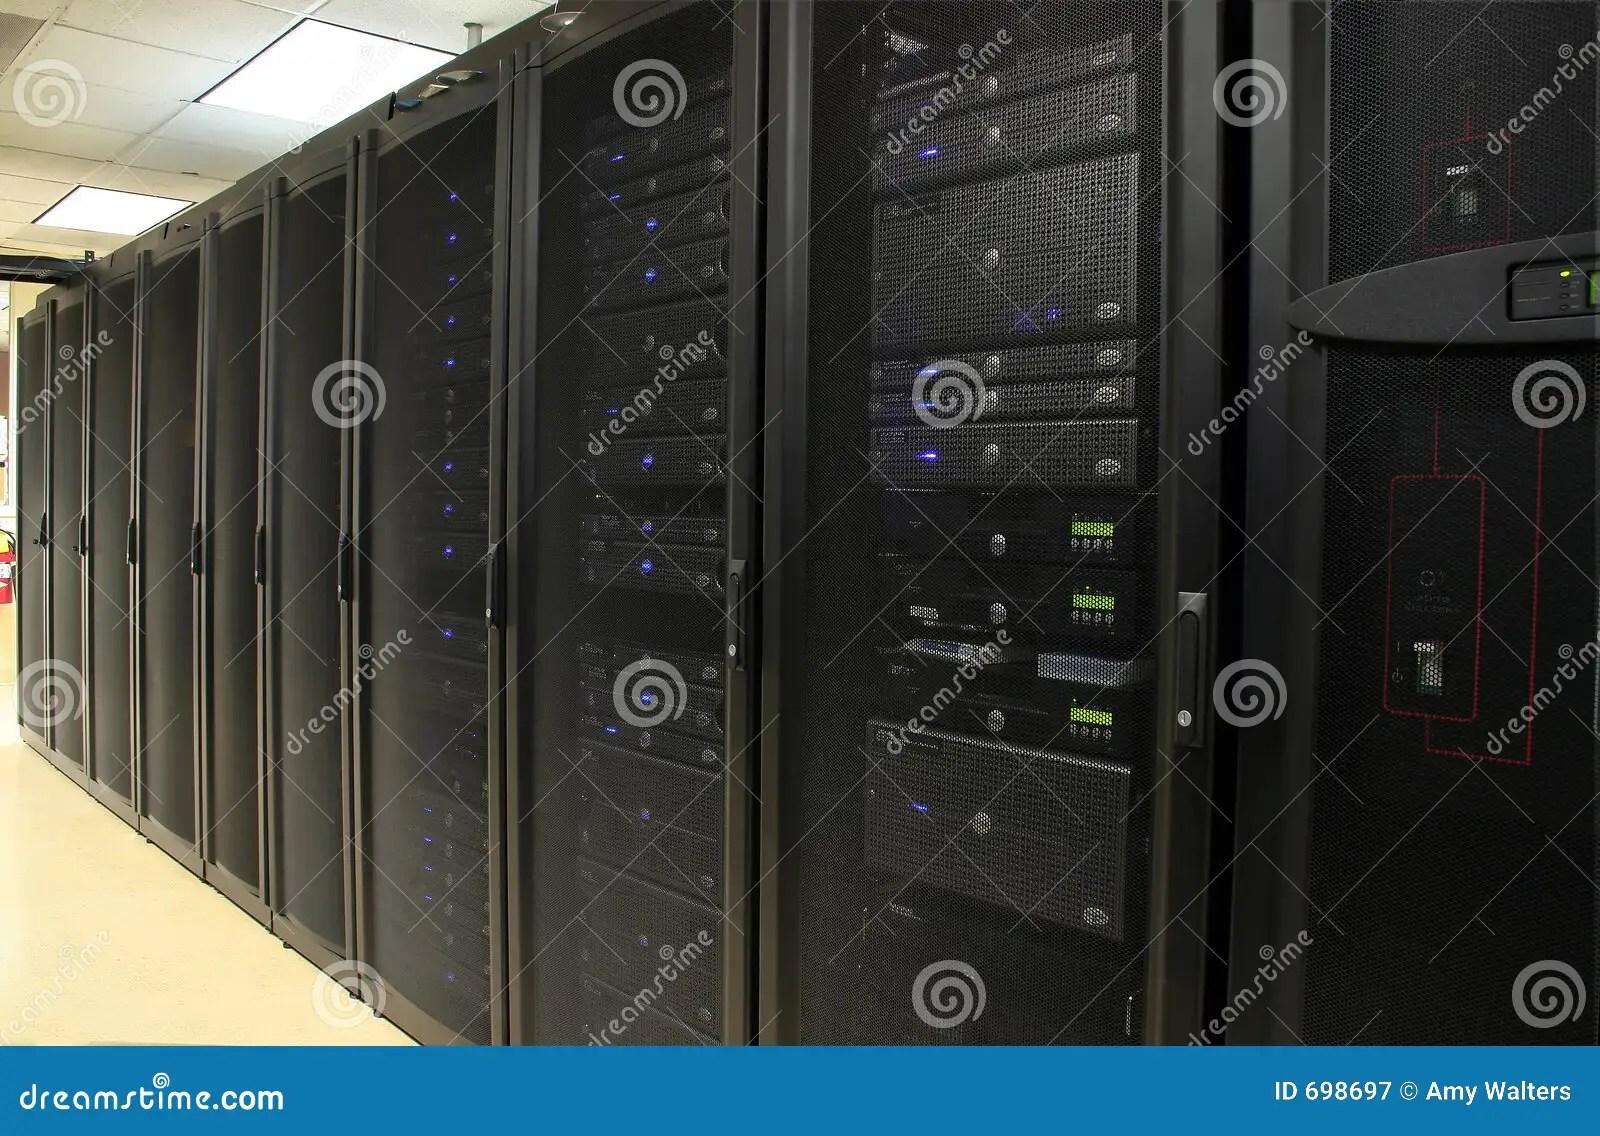 Server Farm Data Center Royalty Free Stock Photography  Image 698697